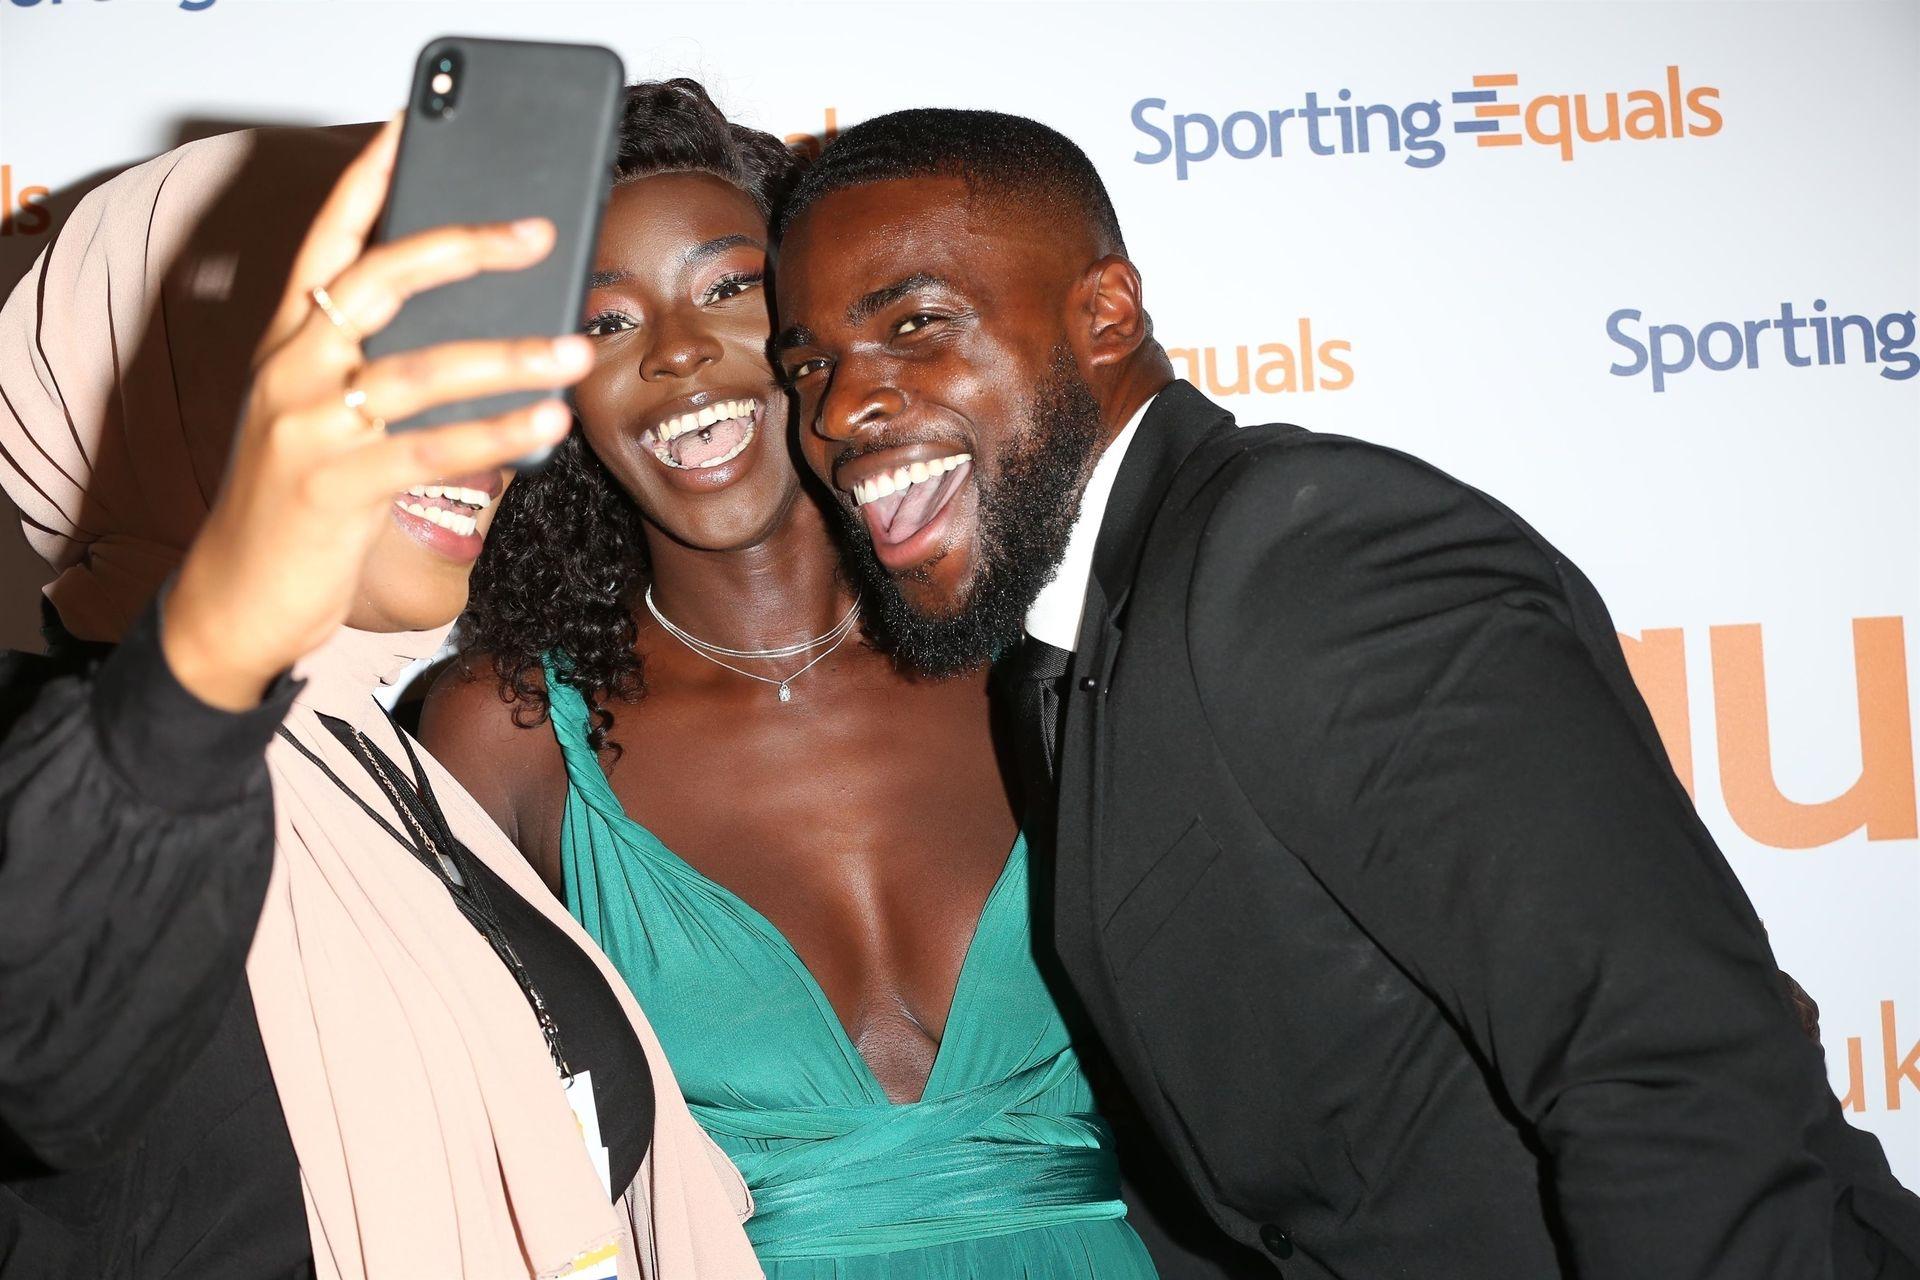 Mike Boateng & Priscilla Anyabu Are Seen At British Ethnic Diversity Sports Awards 0075